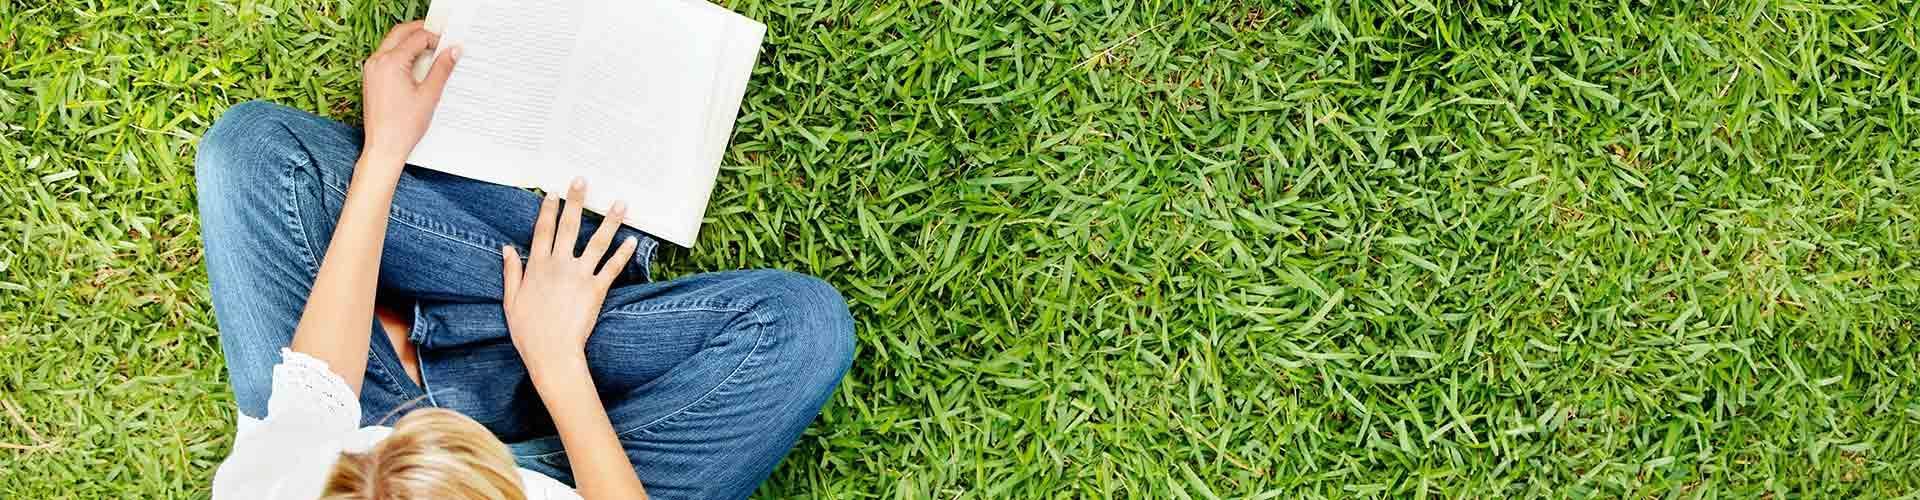 Person read a book in the grass